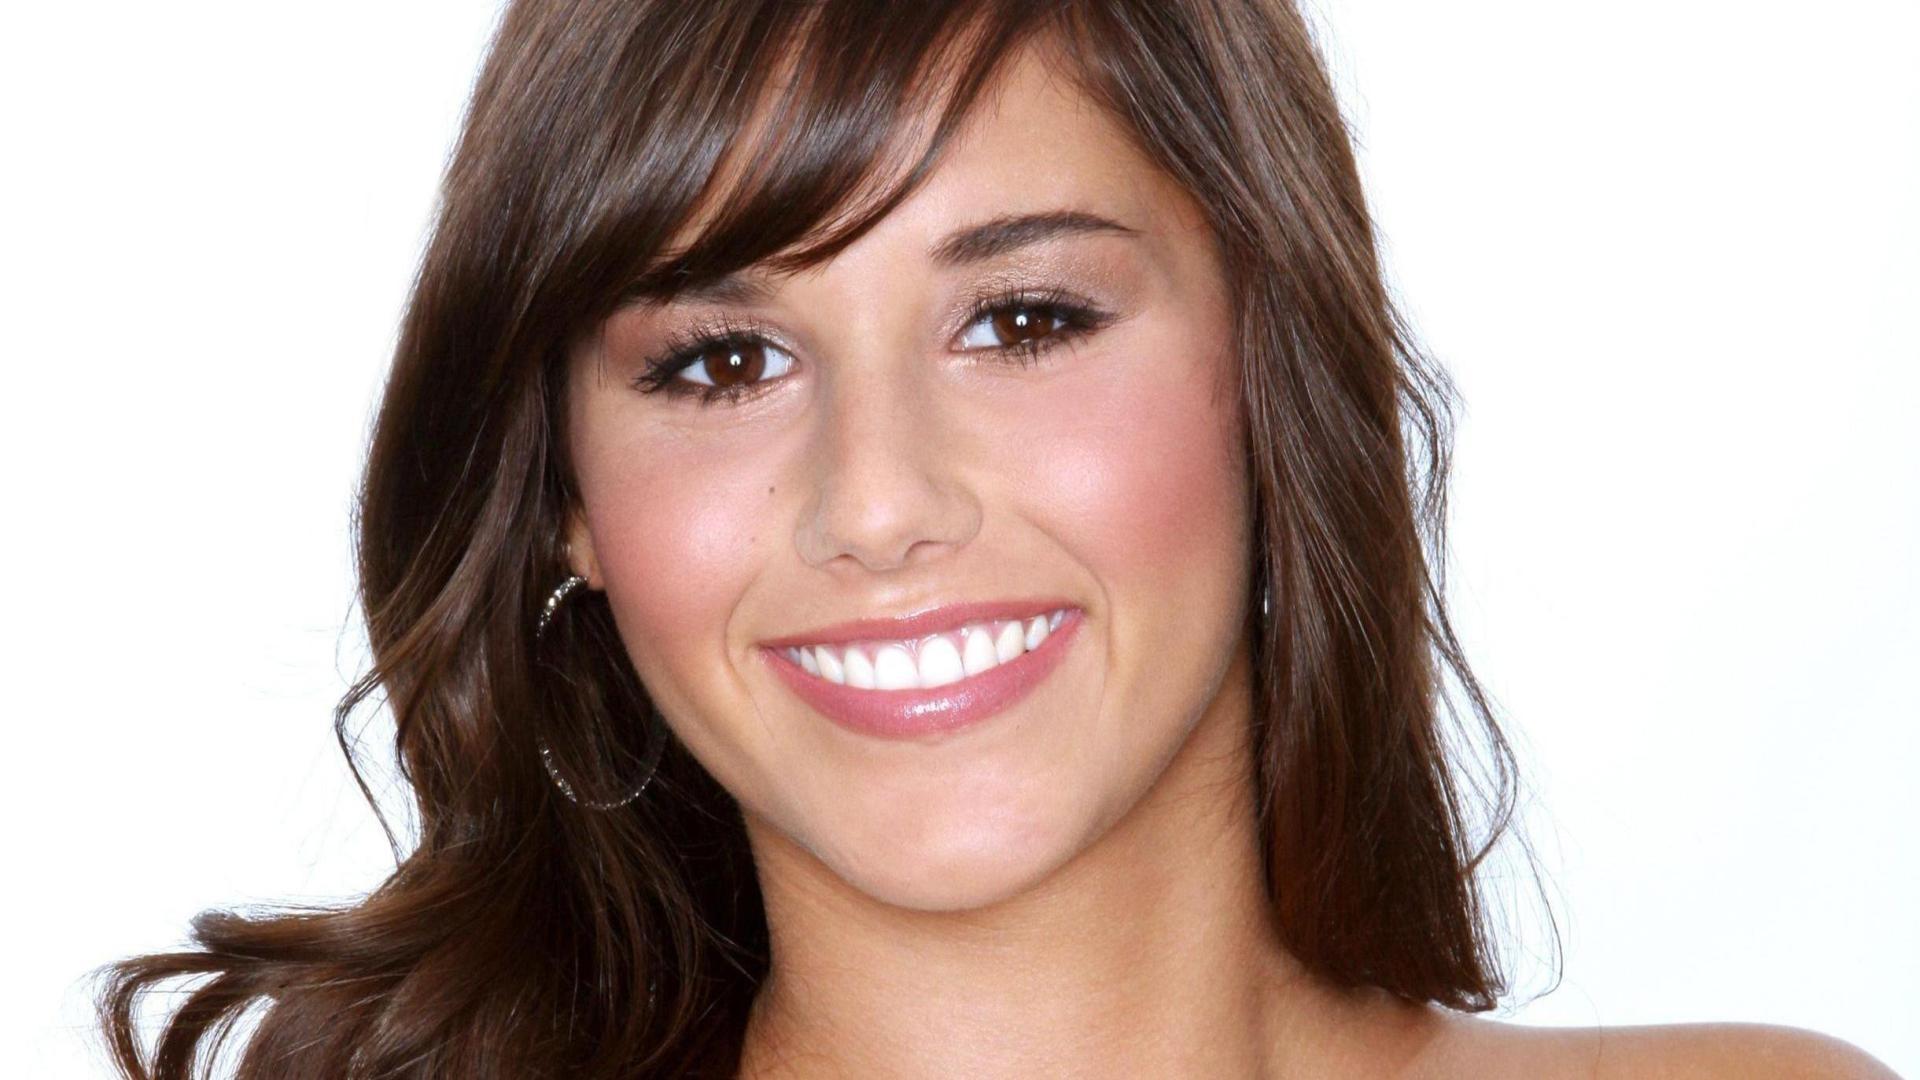 sarah engels, girl, smile Wallpaper, HD Music 4K